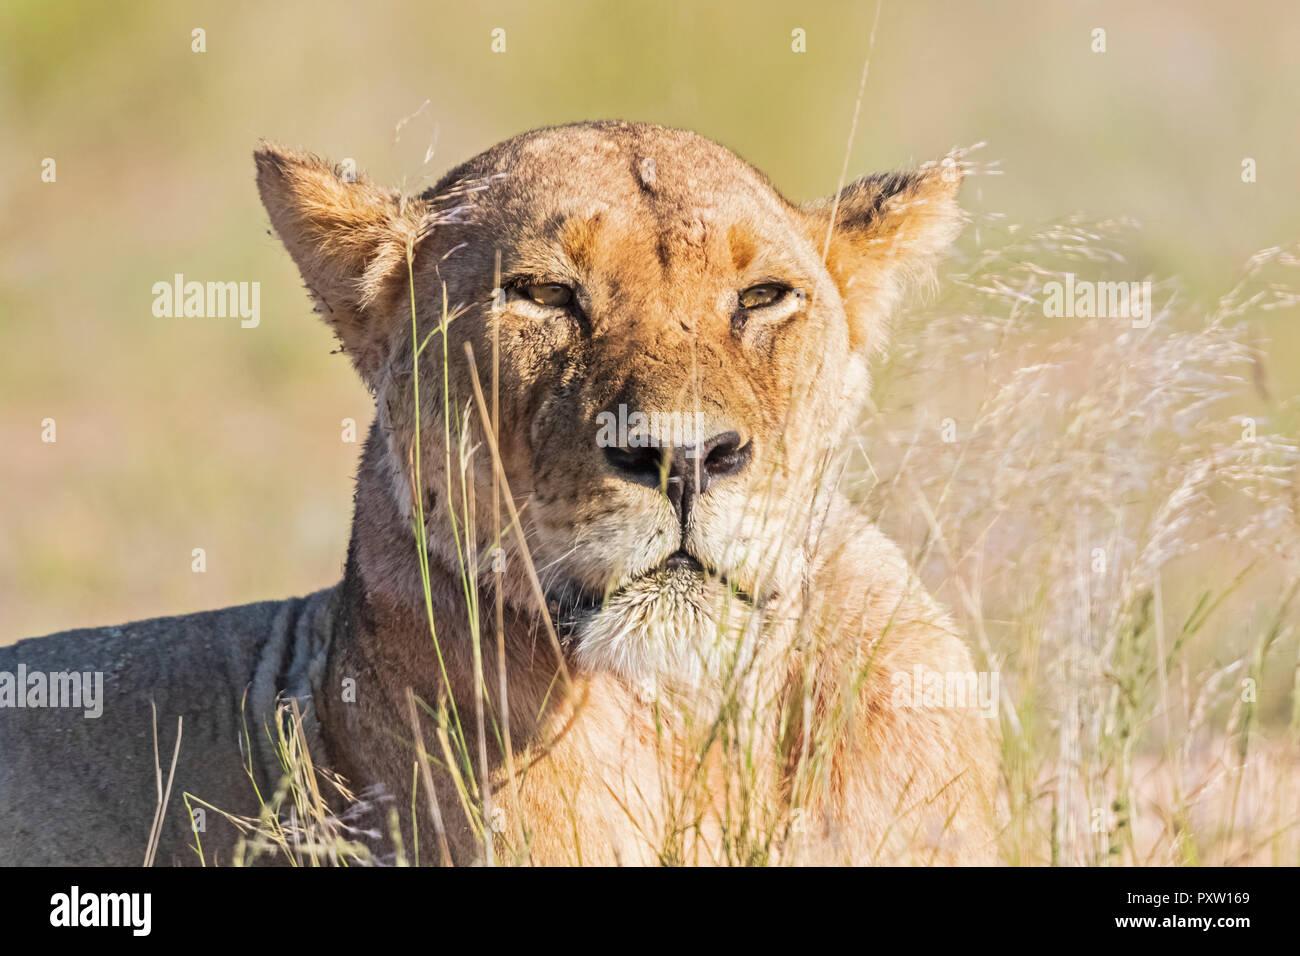 Botswana, Kgalagadi Transfrontier Park, portrait of lioness - Stock Image